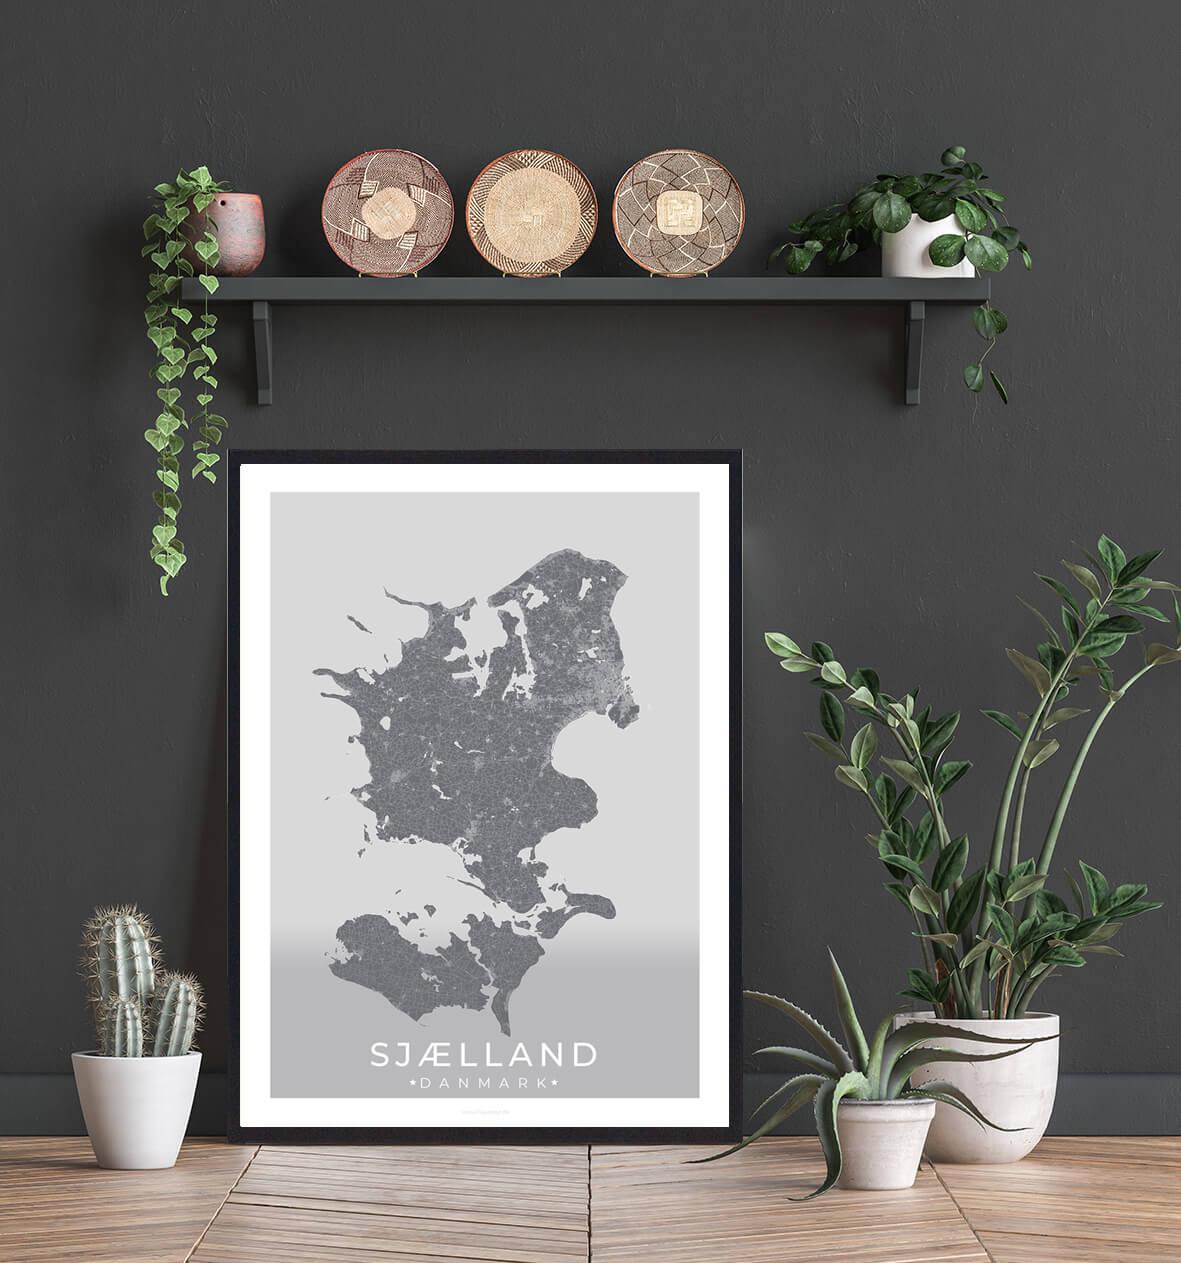 Sjalelland-plakat-boligen-graa-3